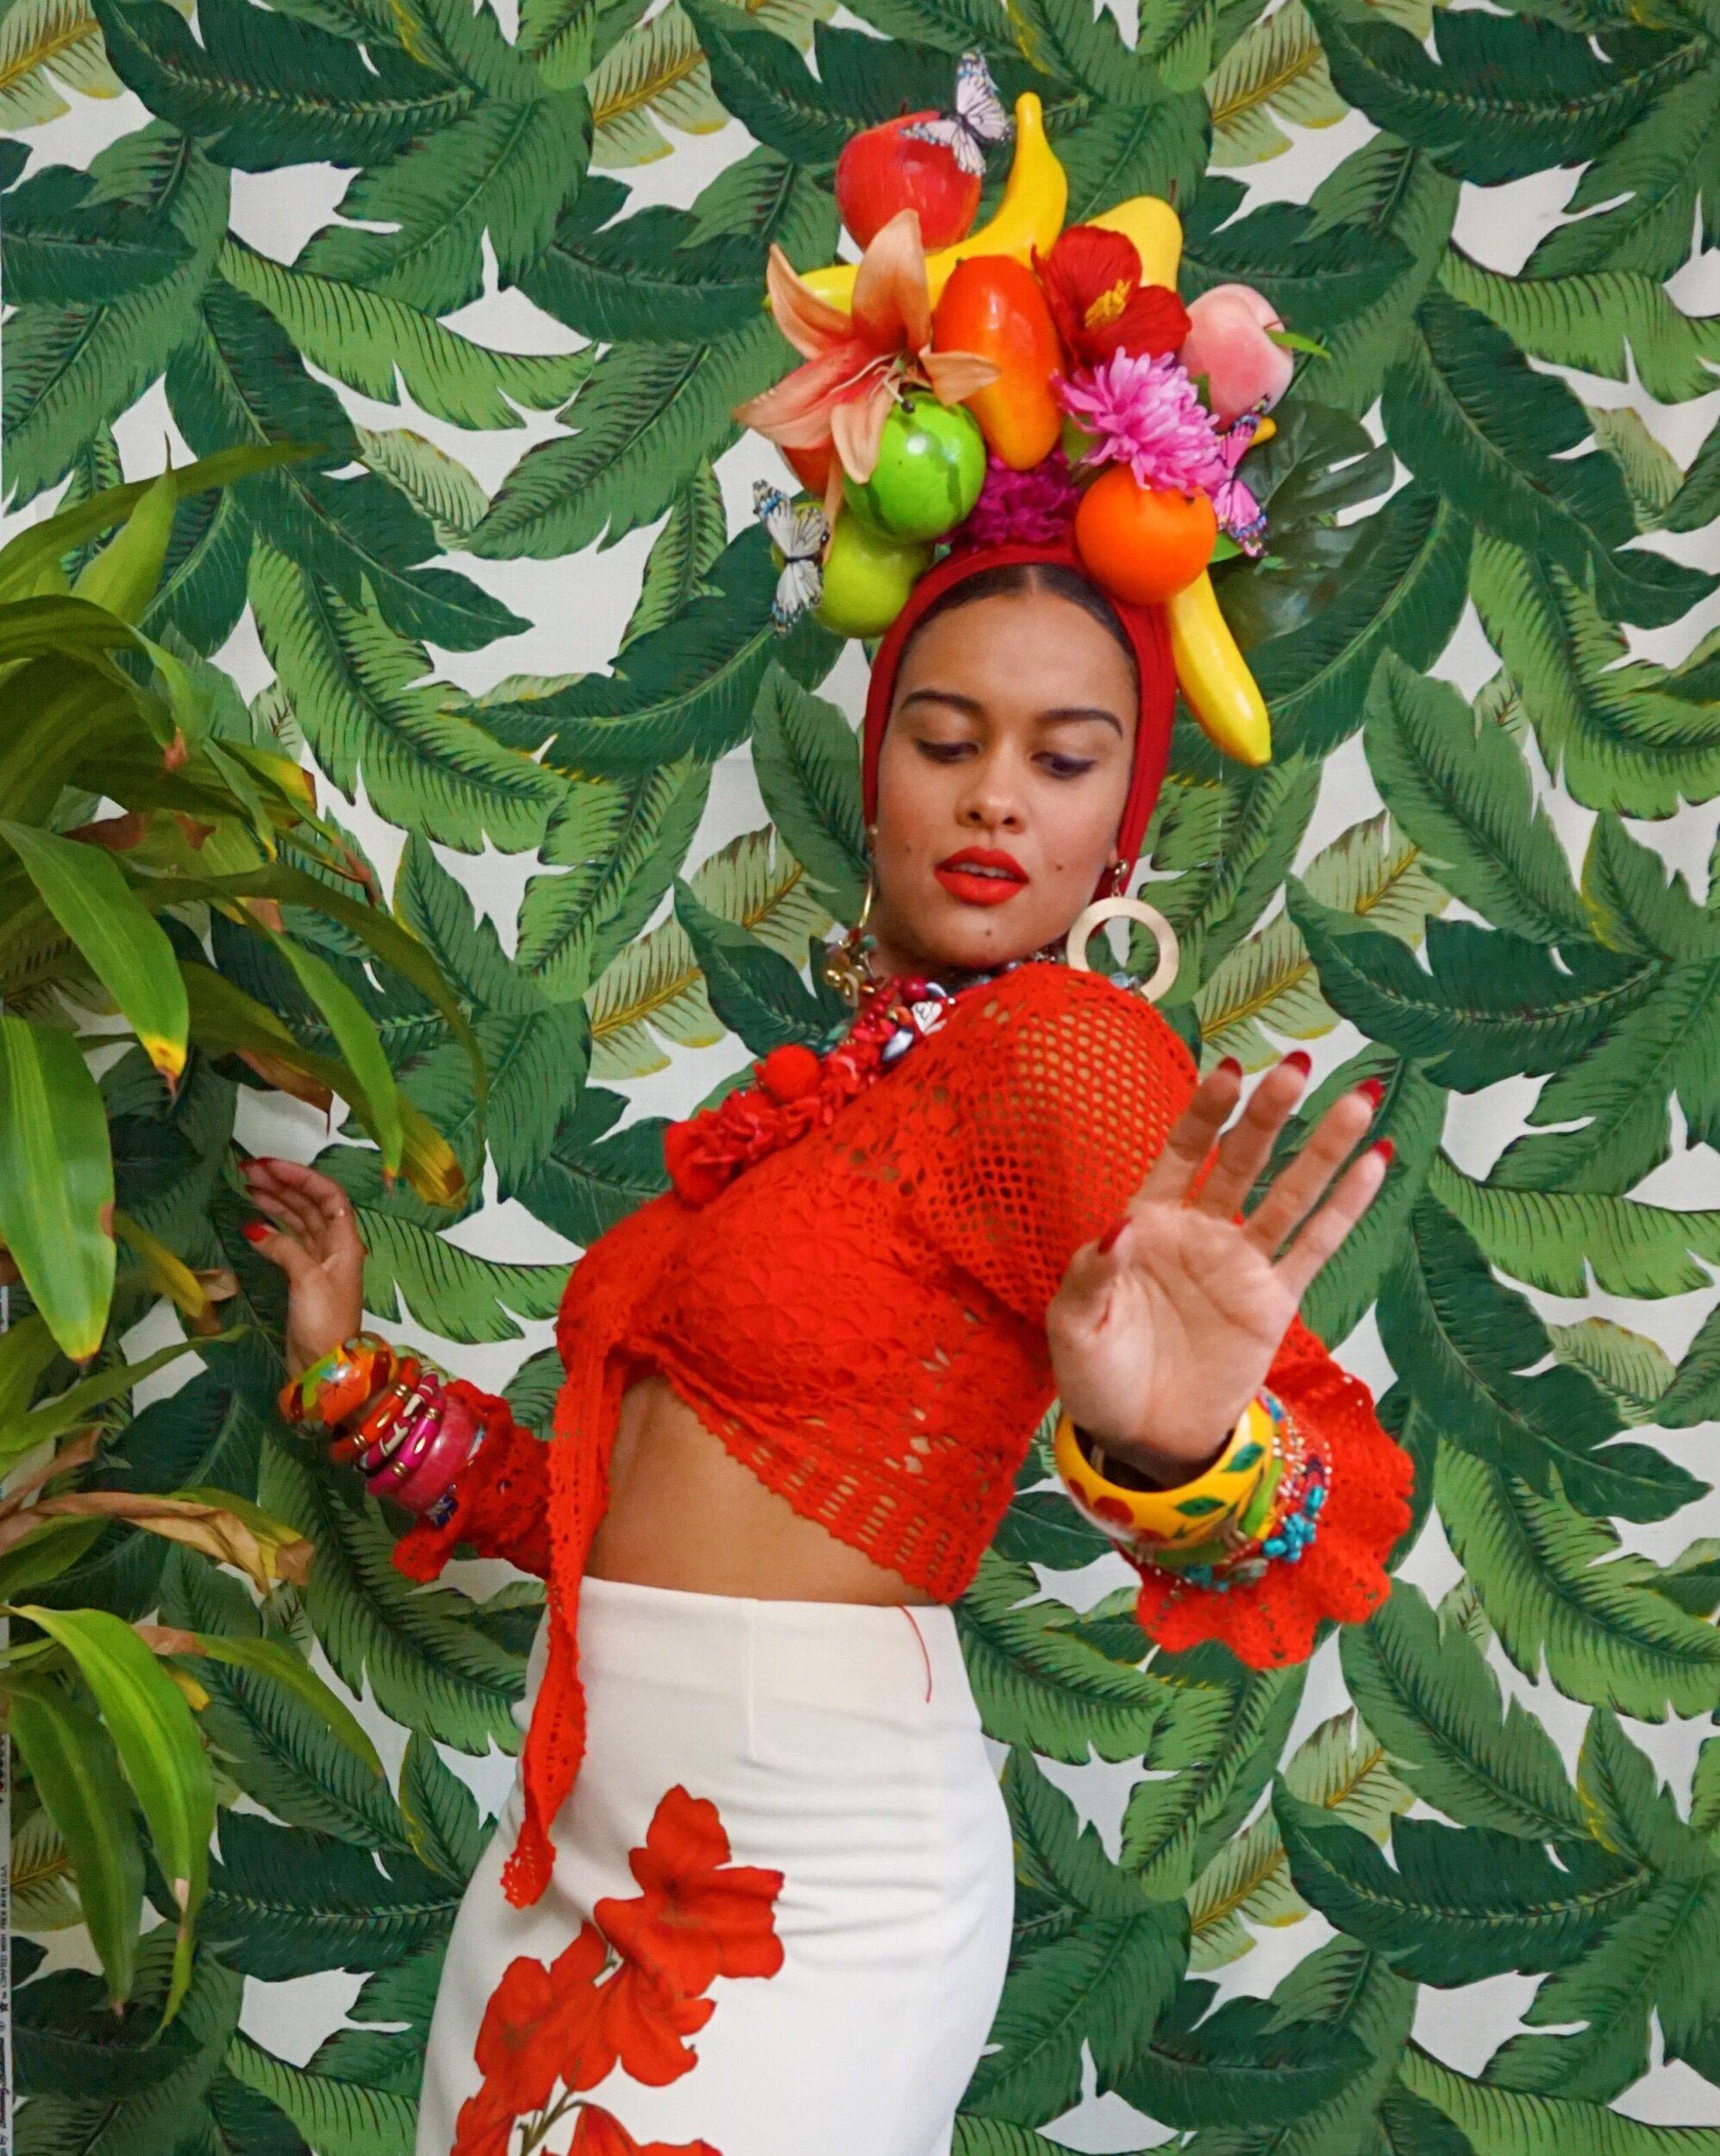 Tutti frutti birthday outfit Carmen Miranda Baby fruit costume